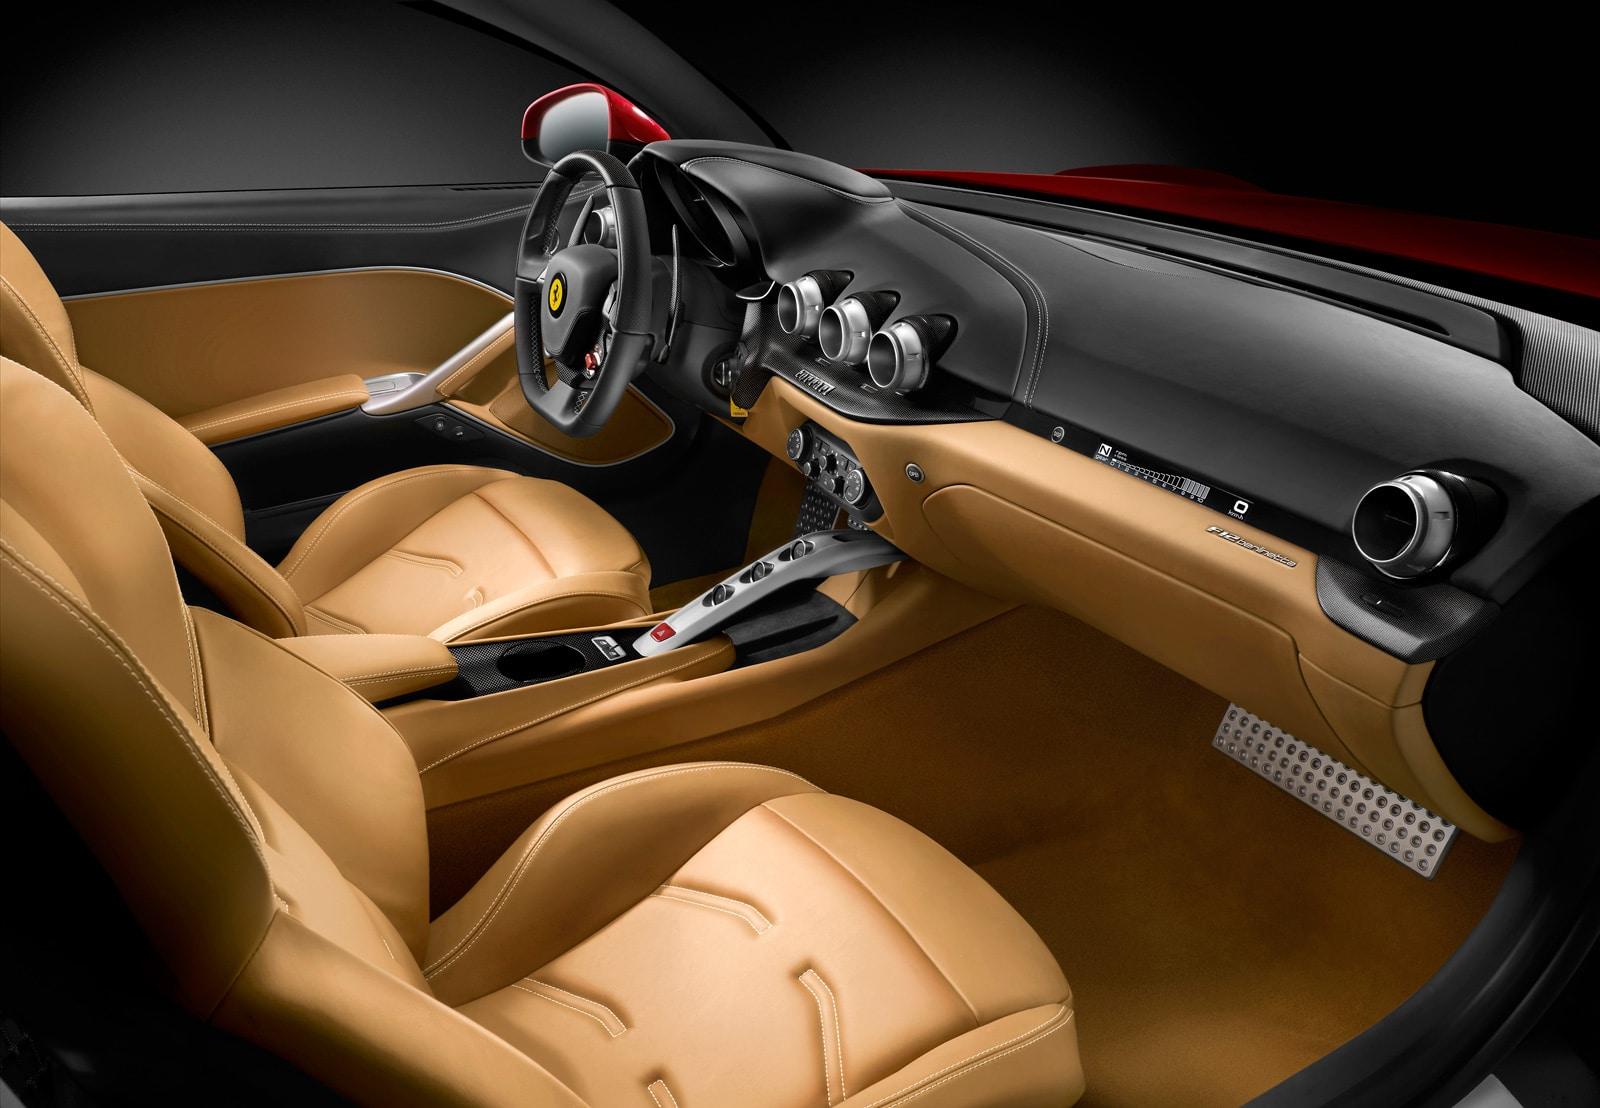 2012-ferrari-f12-berlinetta-interior-2